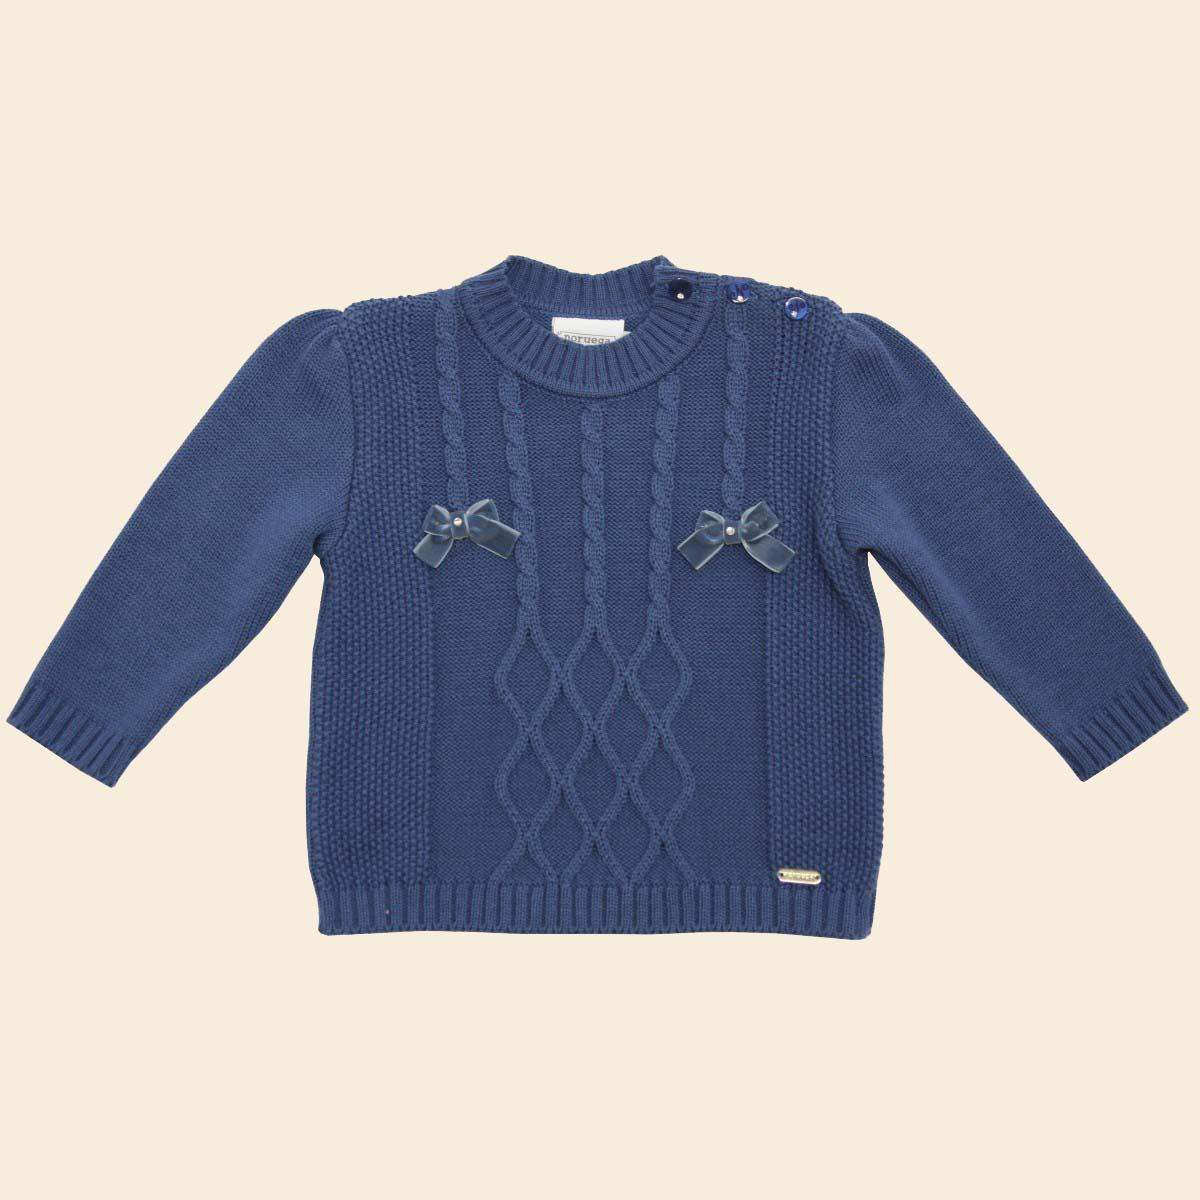 Sweater com Lacinhos  - Loja Noruega